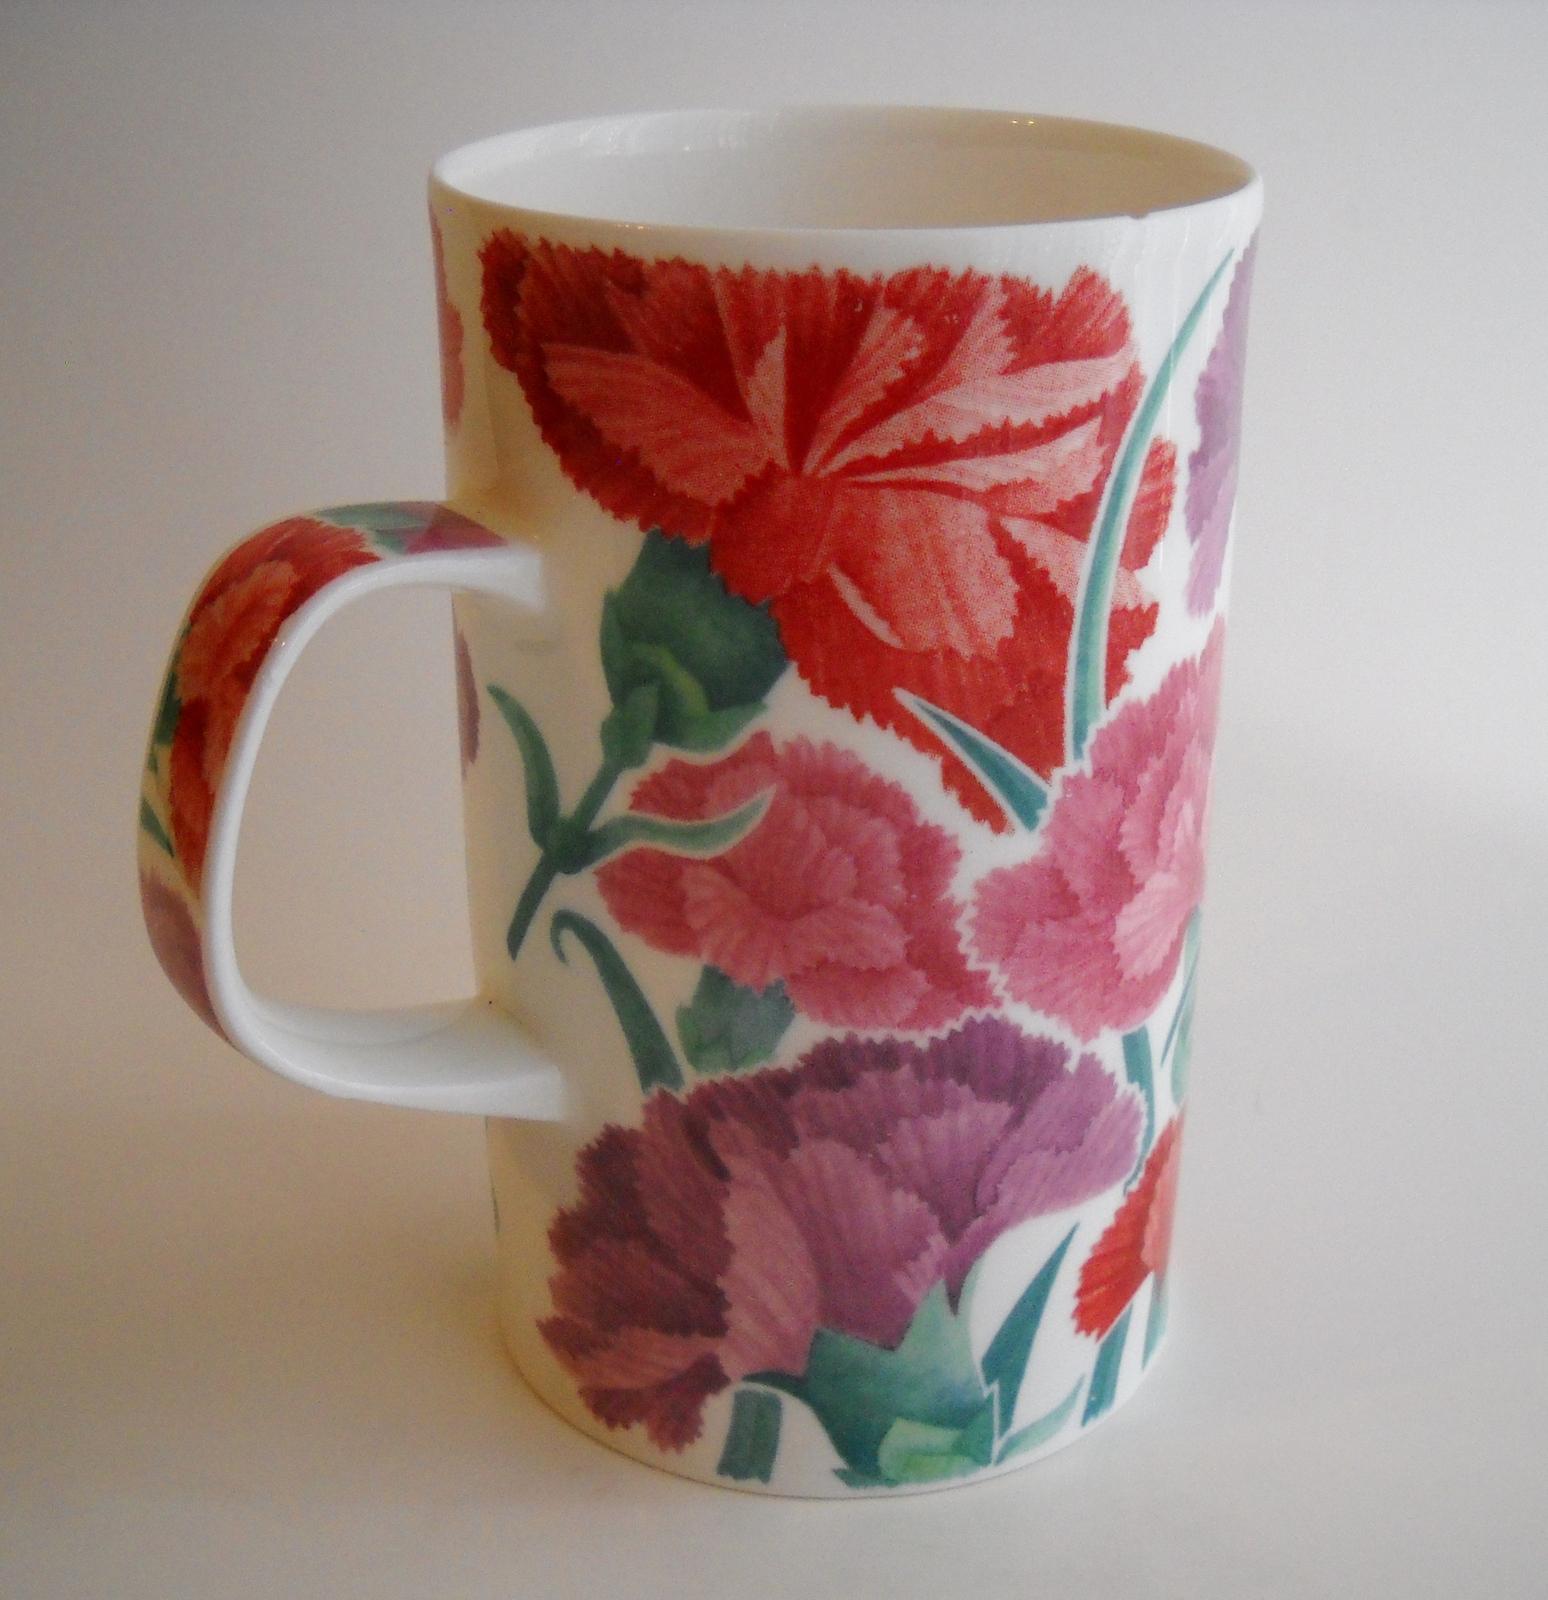 Cup dunoon faversham flowers  1    .25